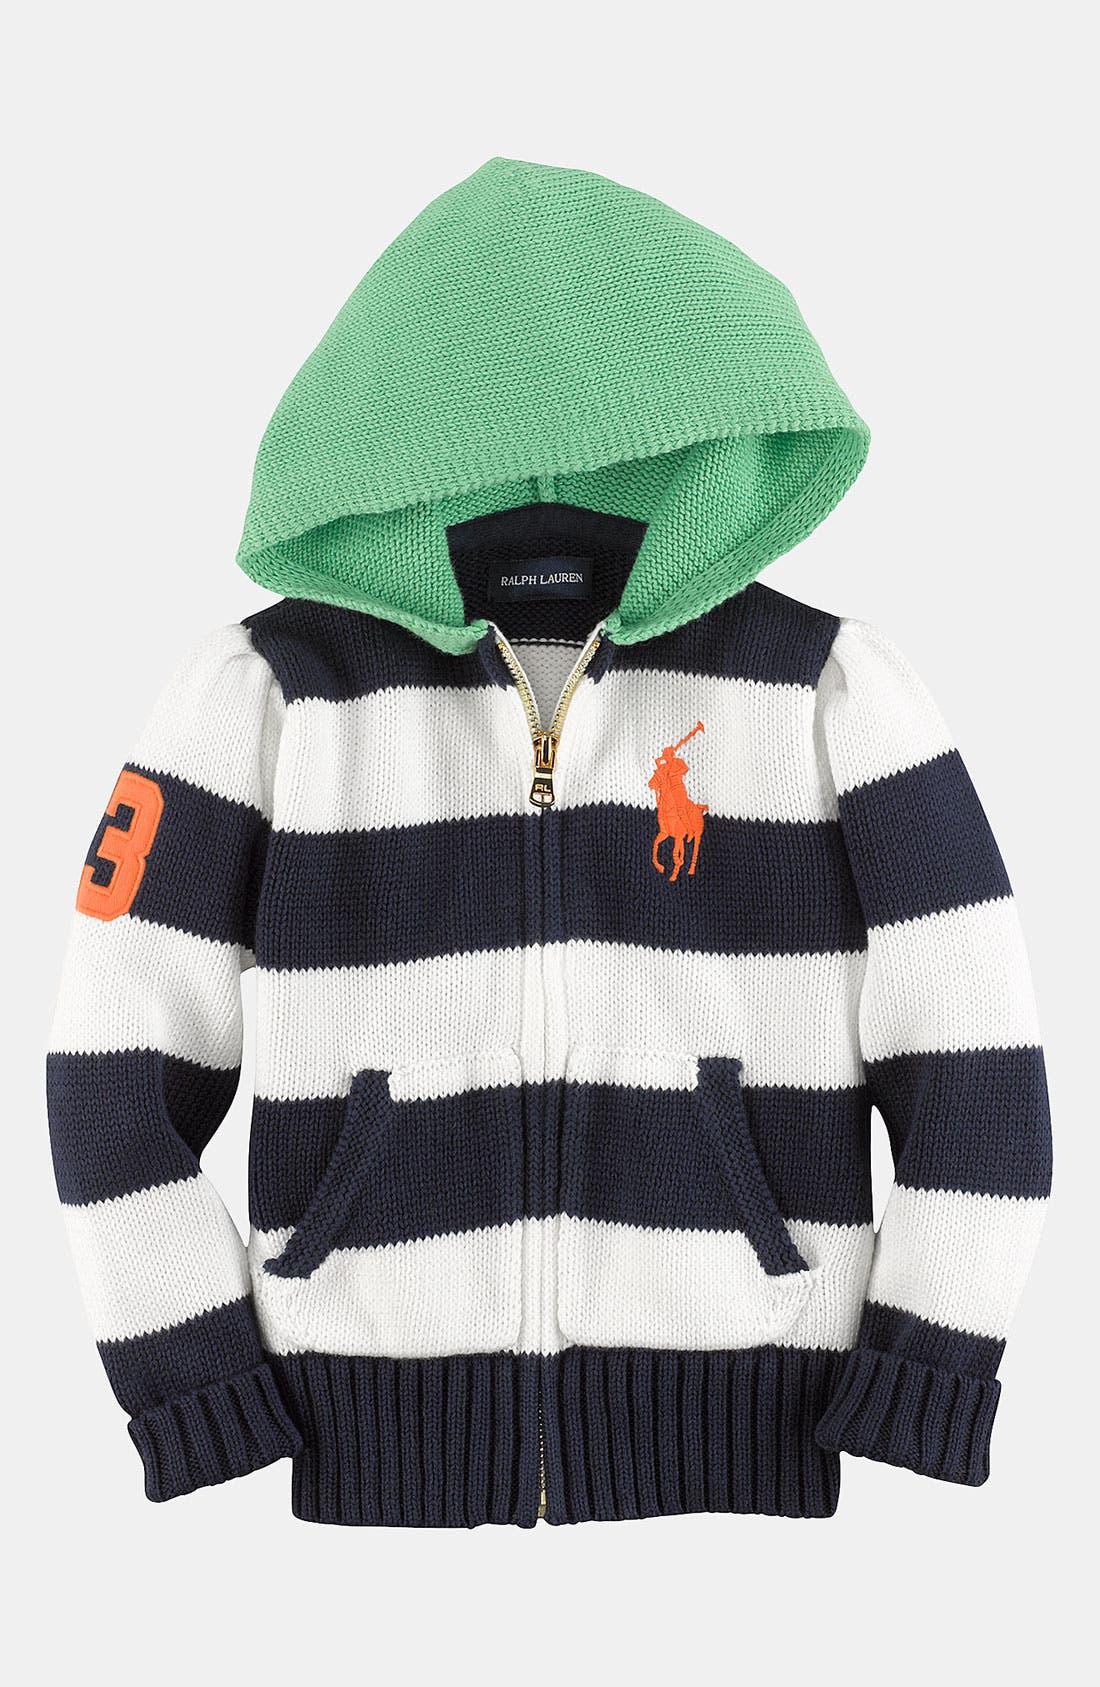 Alternate Image 1 Selected - Ralph Lauren Knit Hoodie Sweater (Toddler)